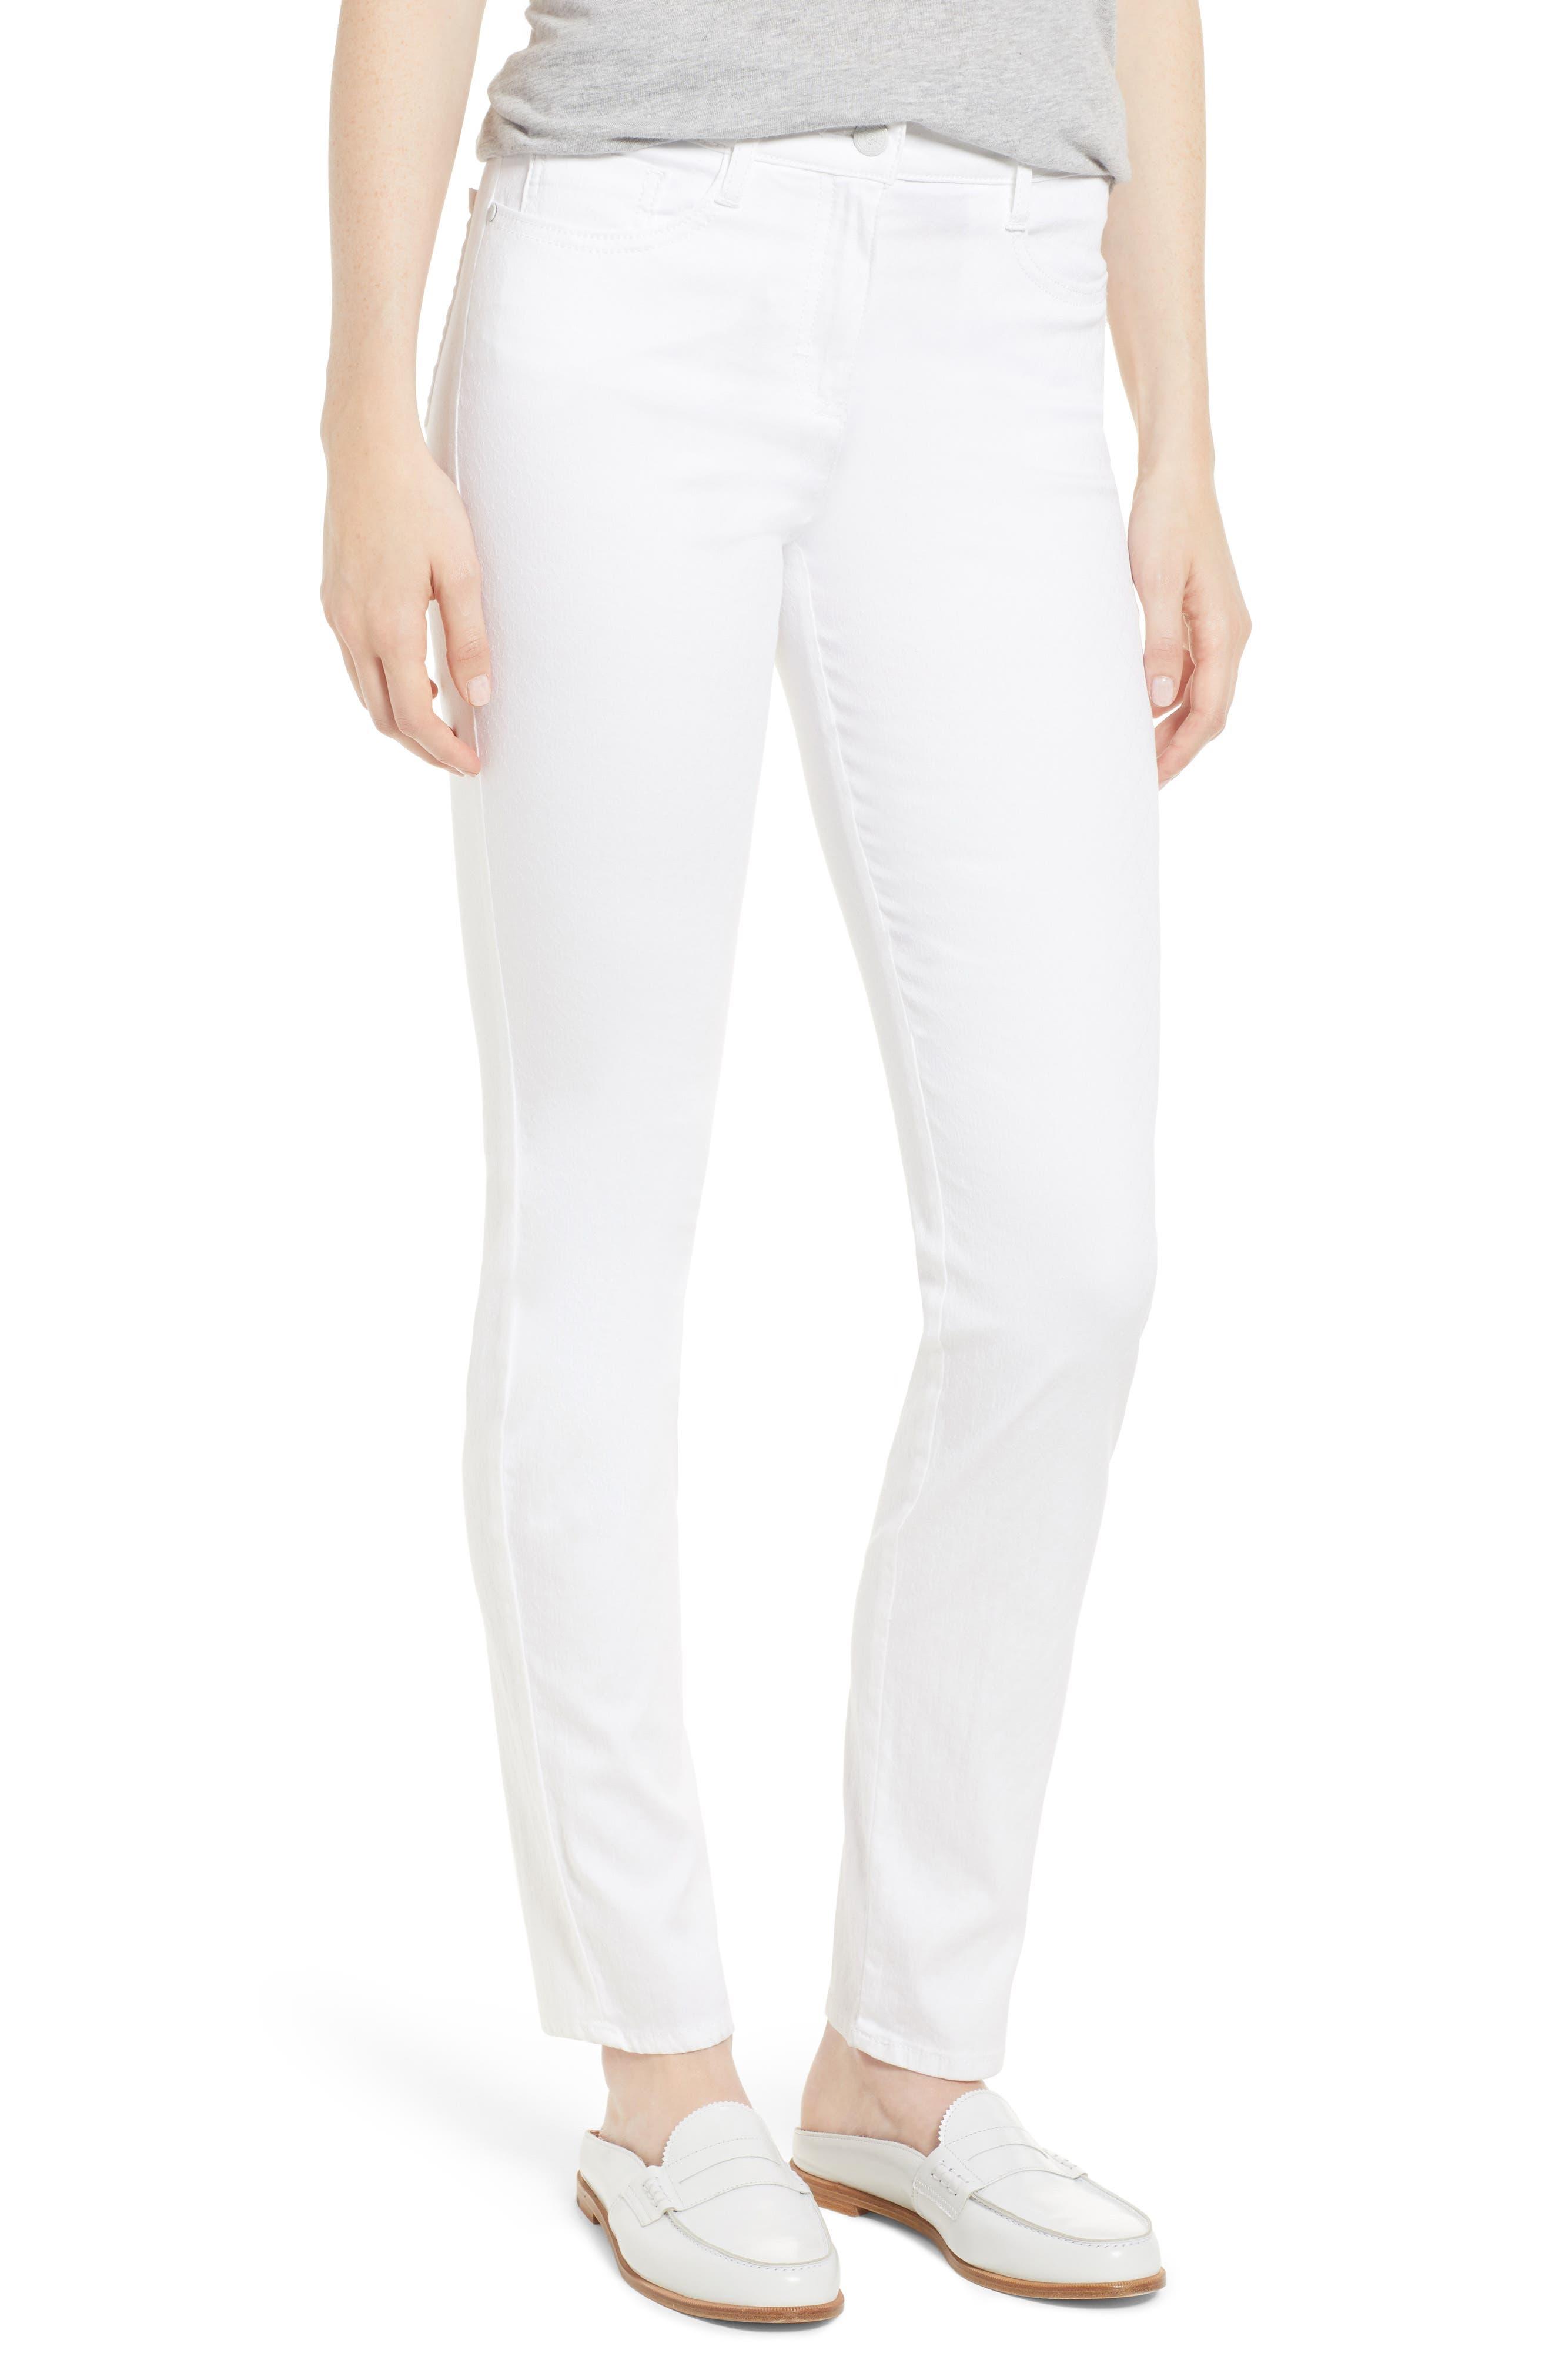 Shakira White Jeans,                         Main,                         color, White